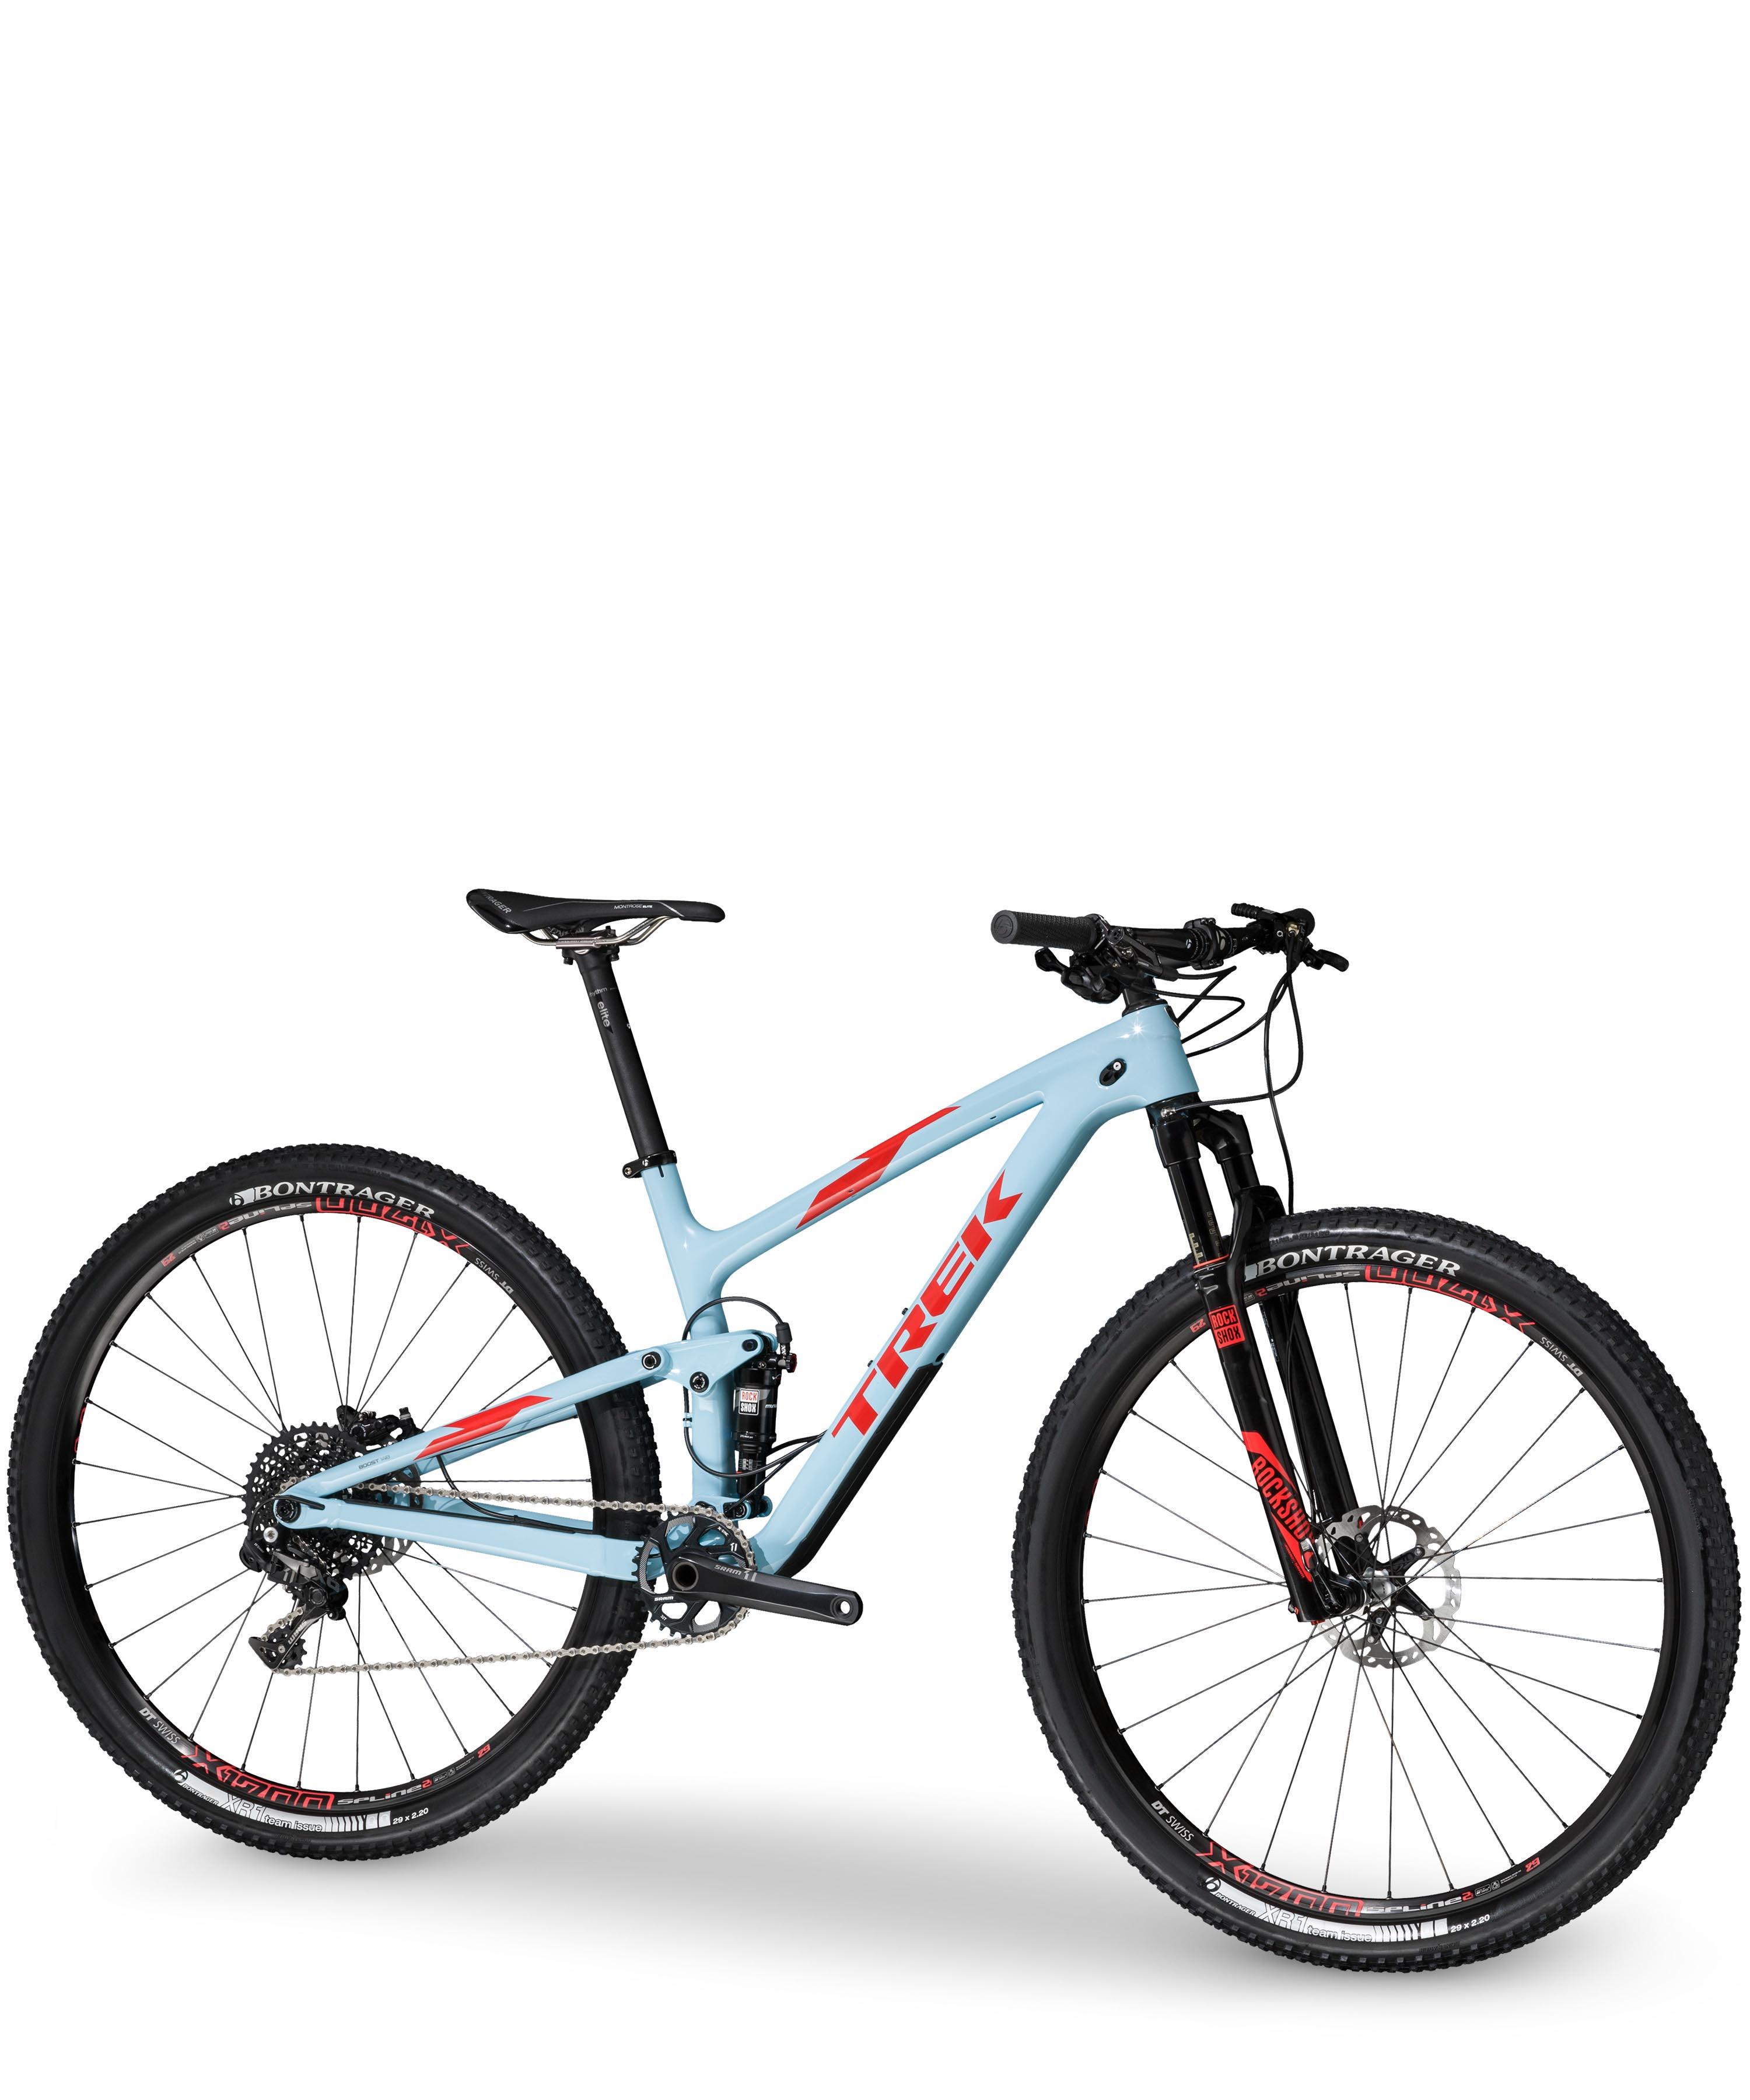 MTB-MAG COM - Mountain Bike Magazine   Trek unveils all-new Top Fuel